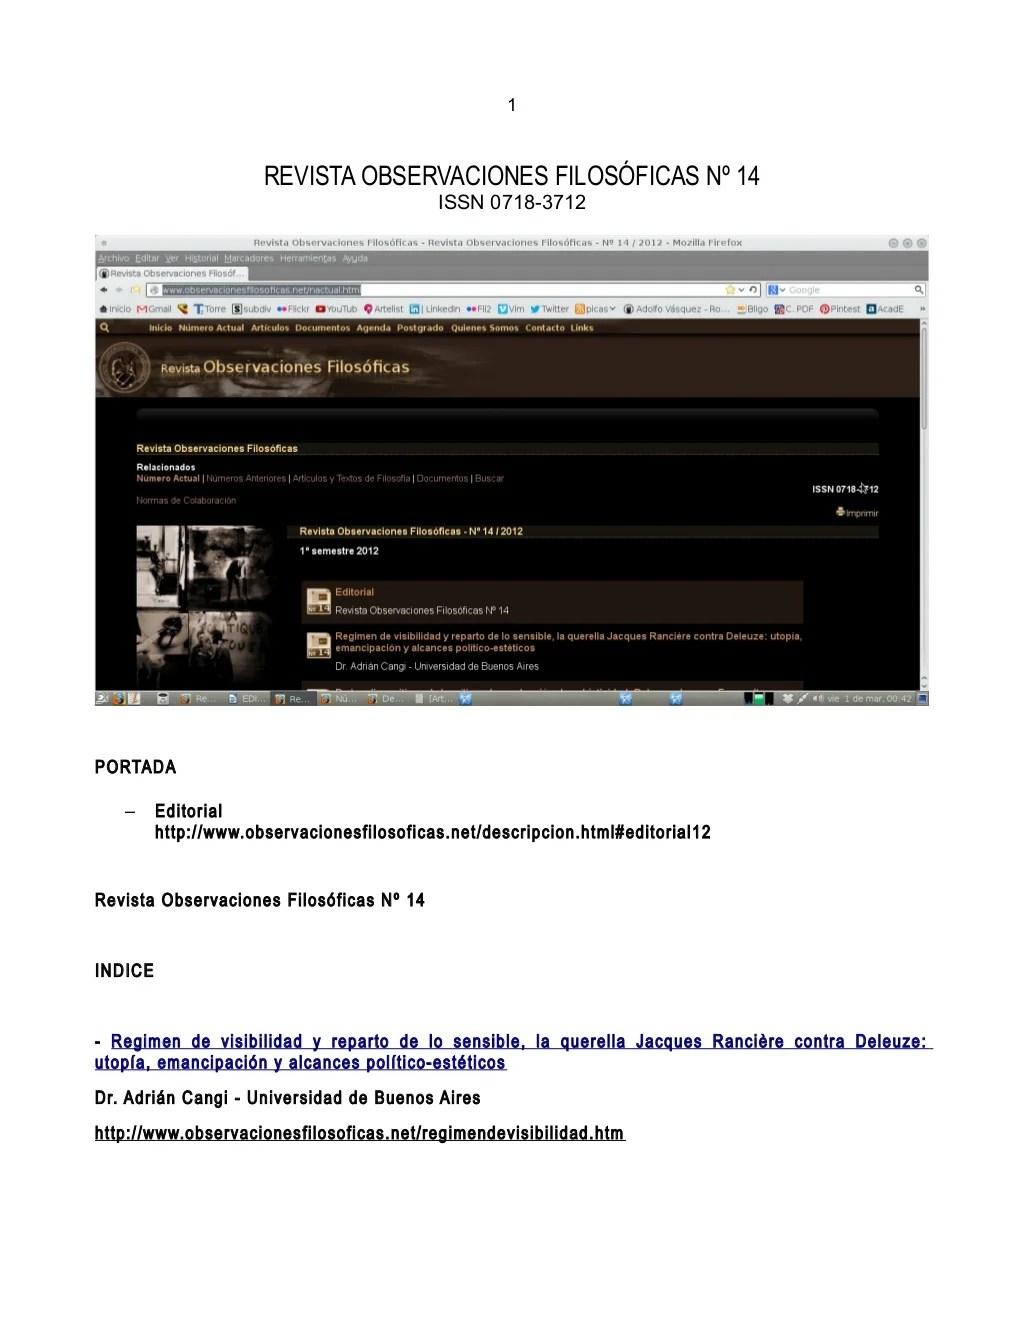 https://i0.wp.com/image.slidesharecdn.com/revistaobservacionesfilosficasn14indice-130308182334-phpapp02/95/slide-1-1024.jpg